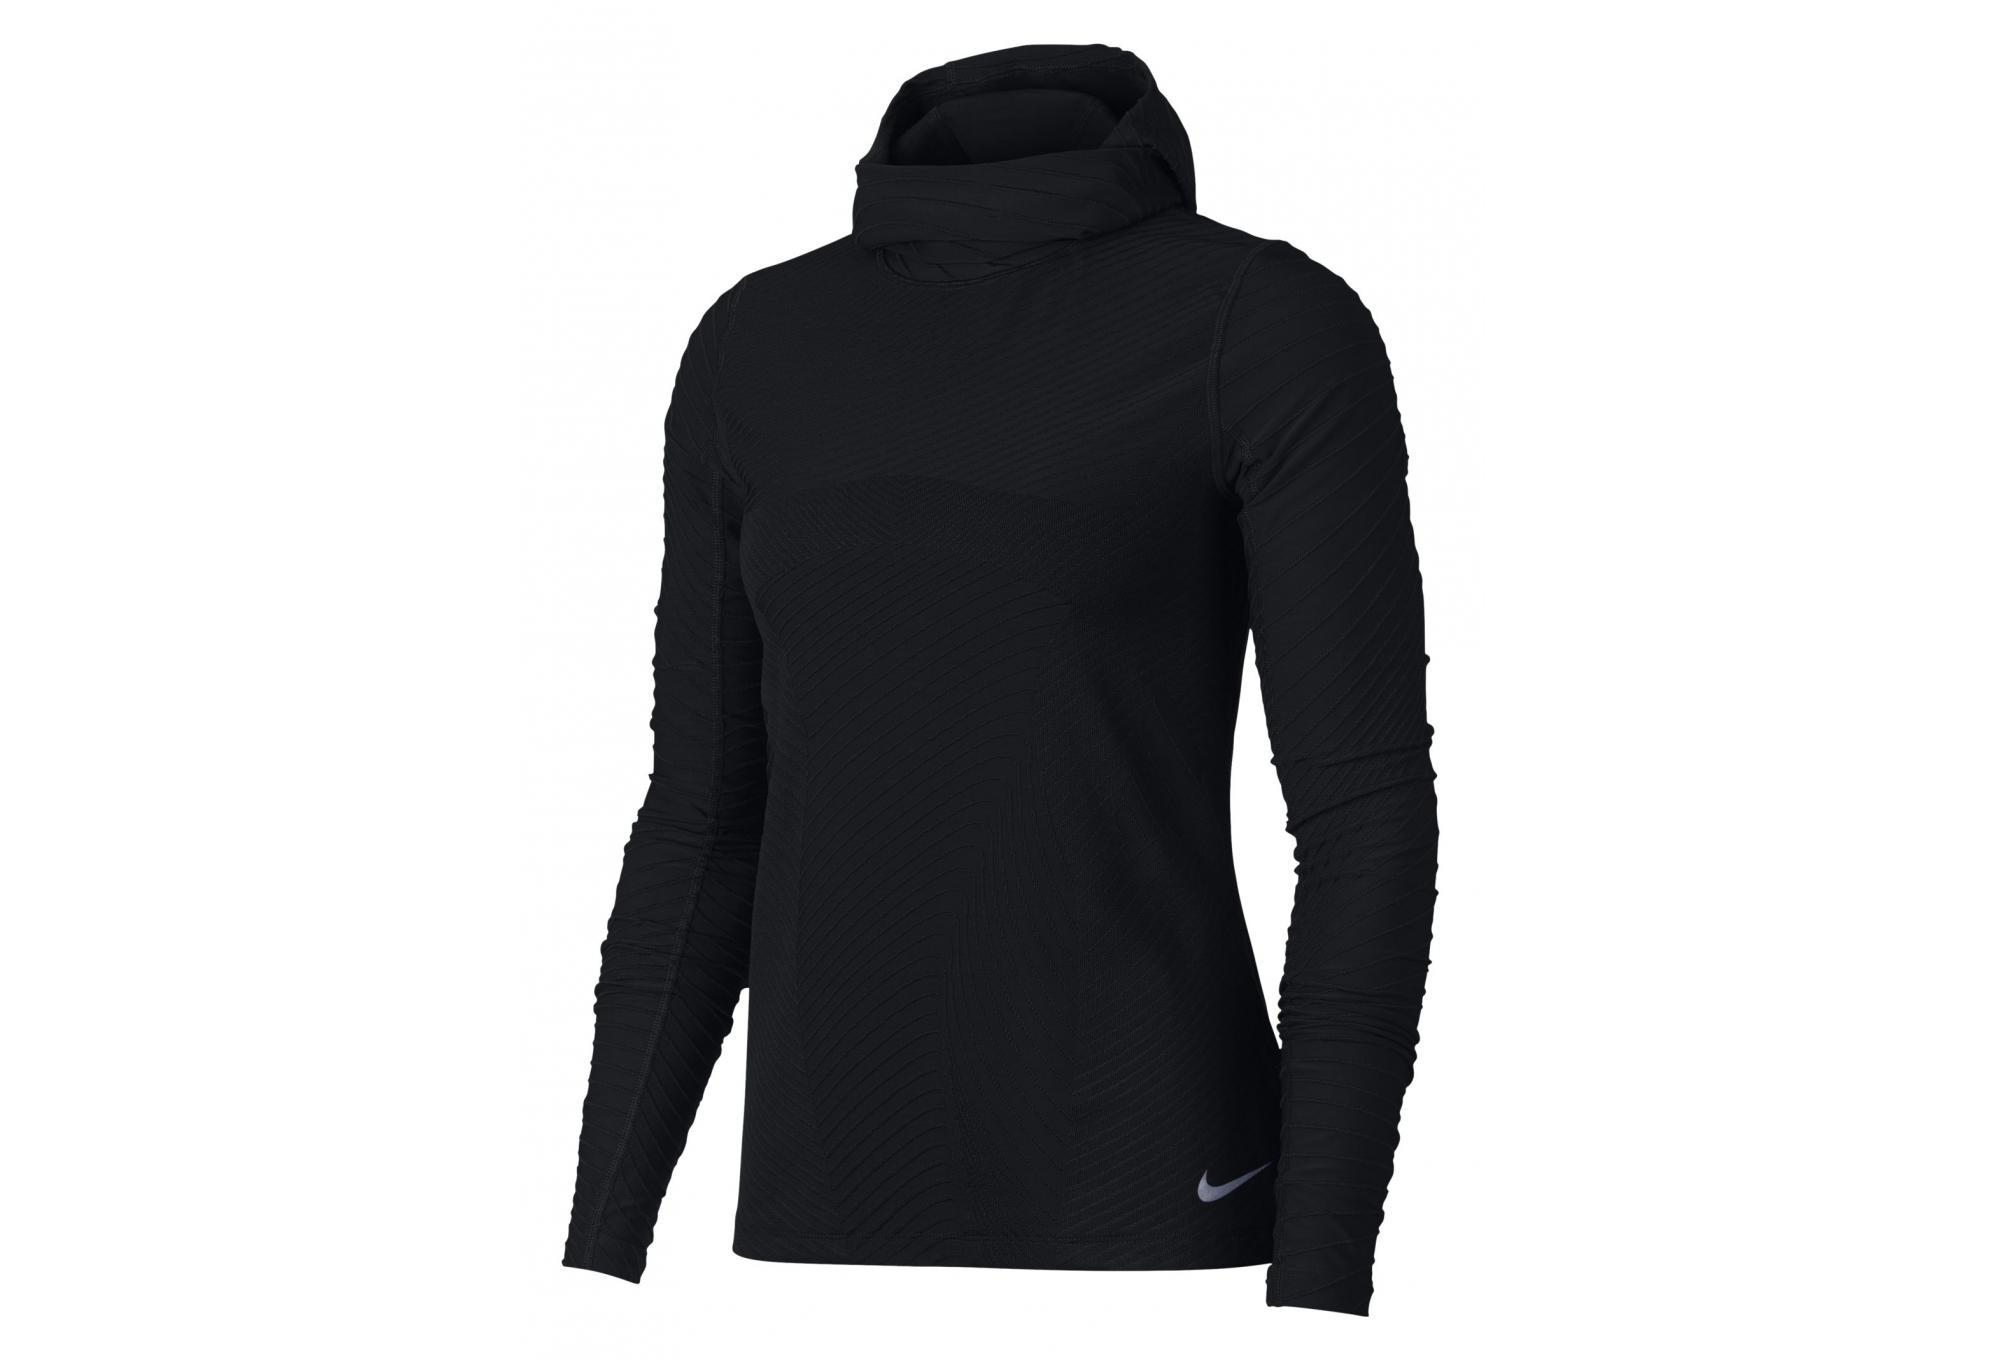 c56ff7eb370bf Nike Element Women's Hooded Long Sleeves Jersey Black | Alltricks.com